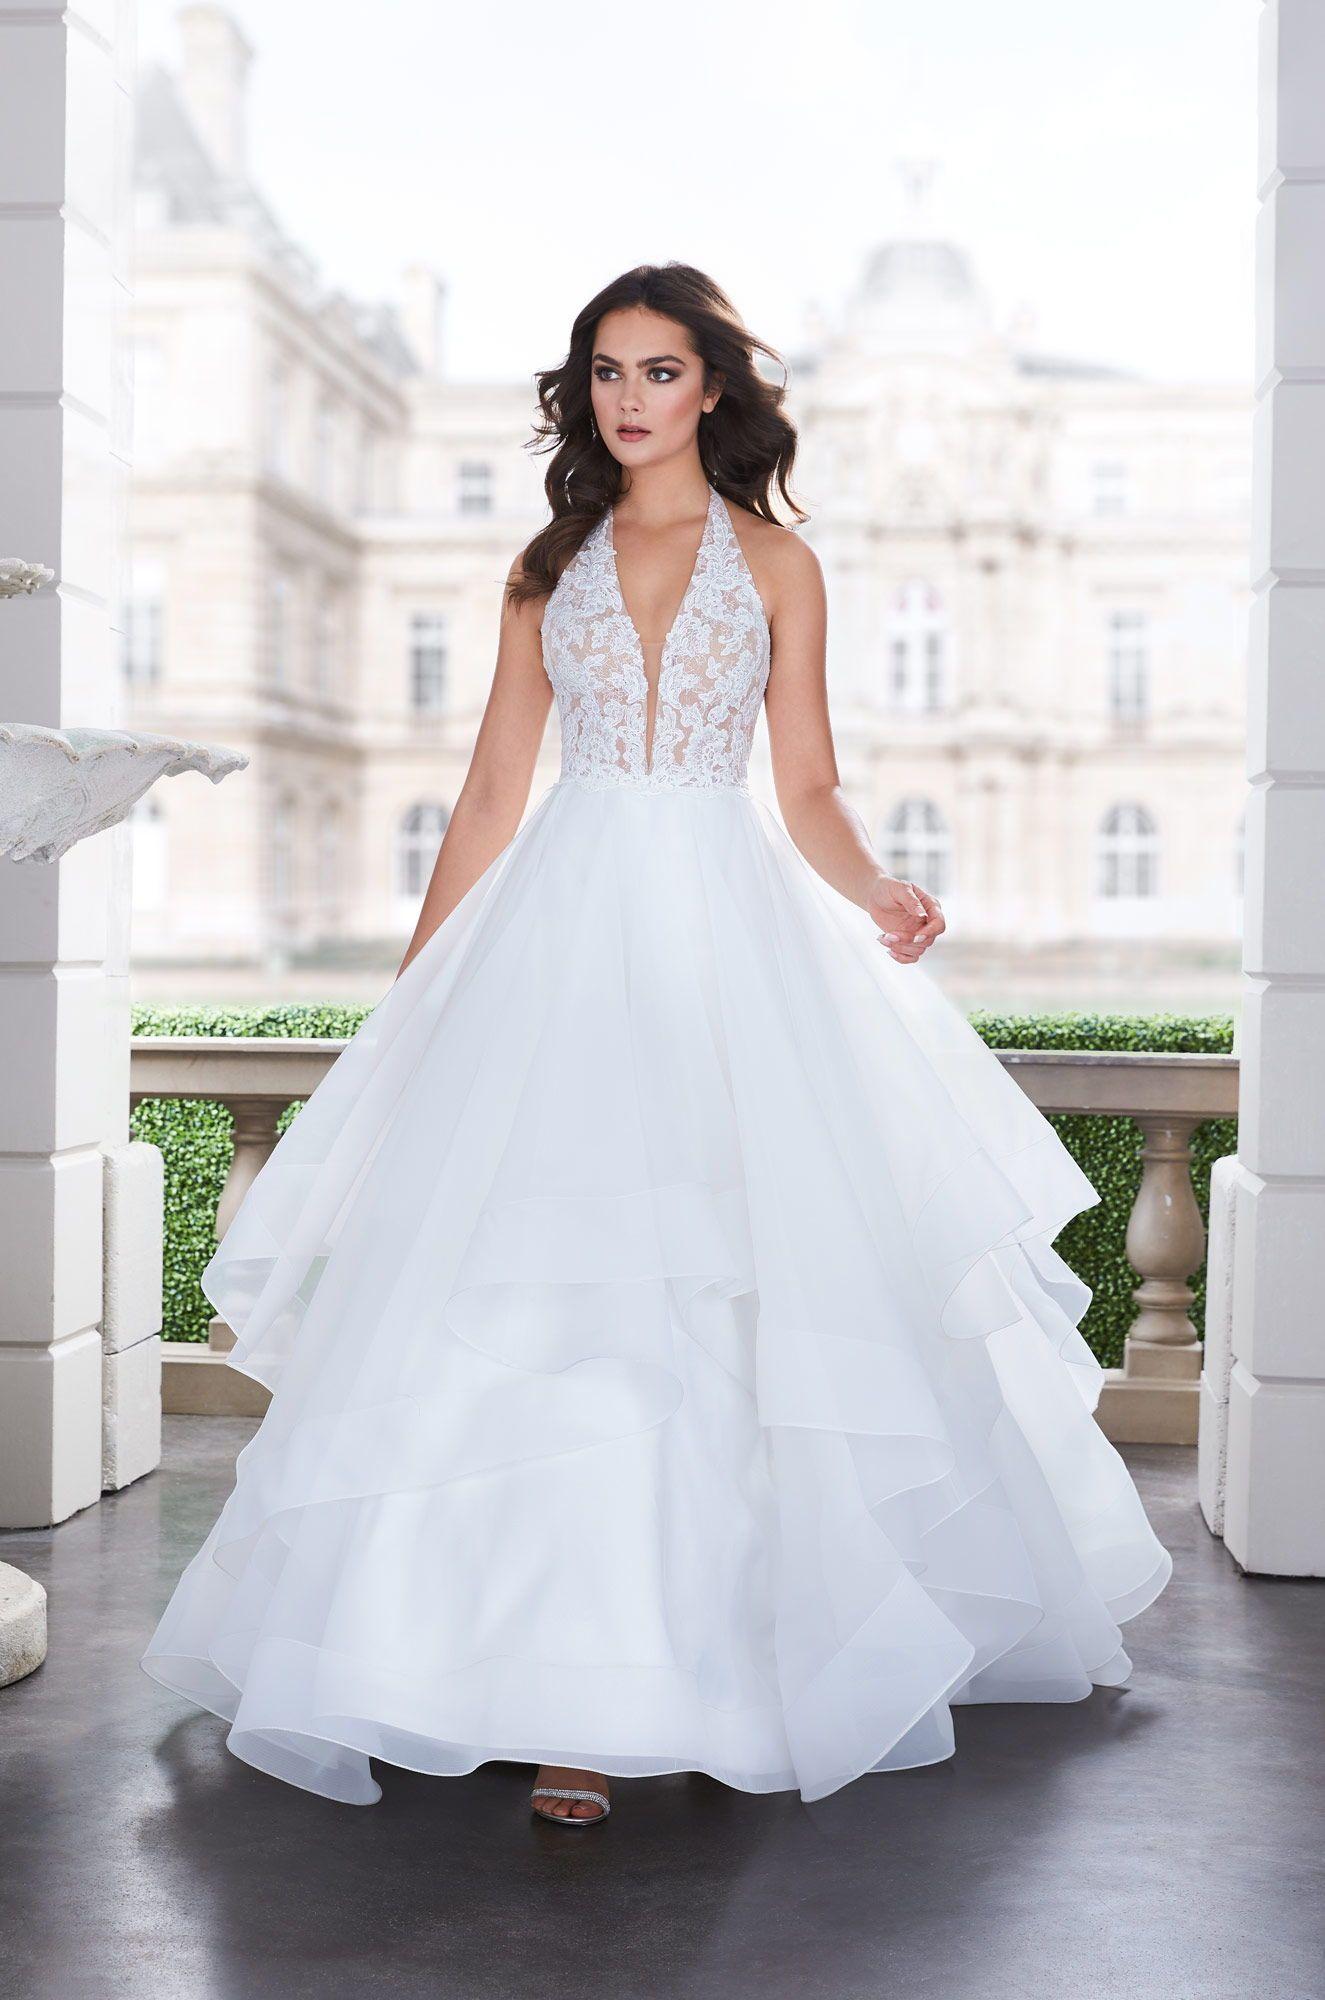 Lavish Ball Gown Wedding Dress - Style #4855 | Alencon